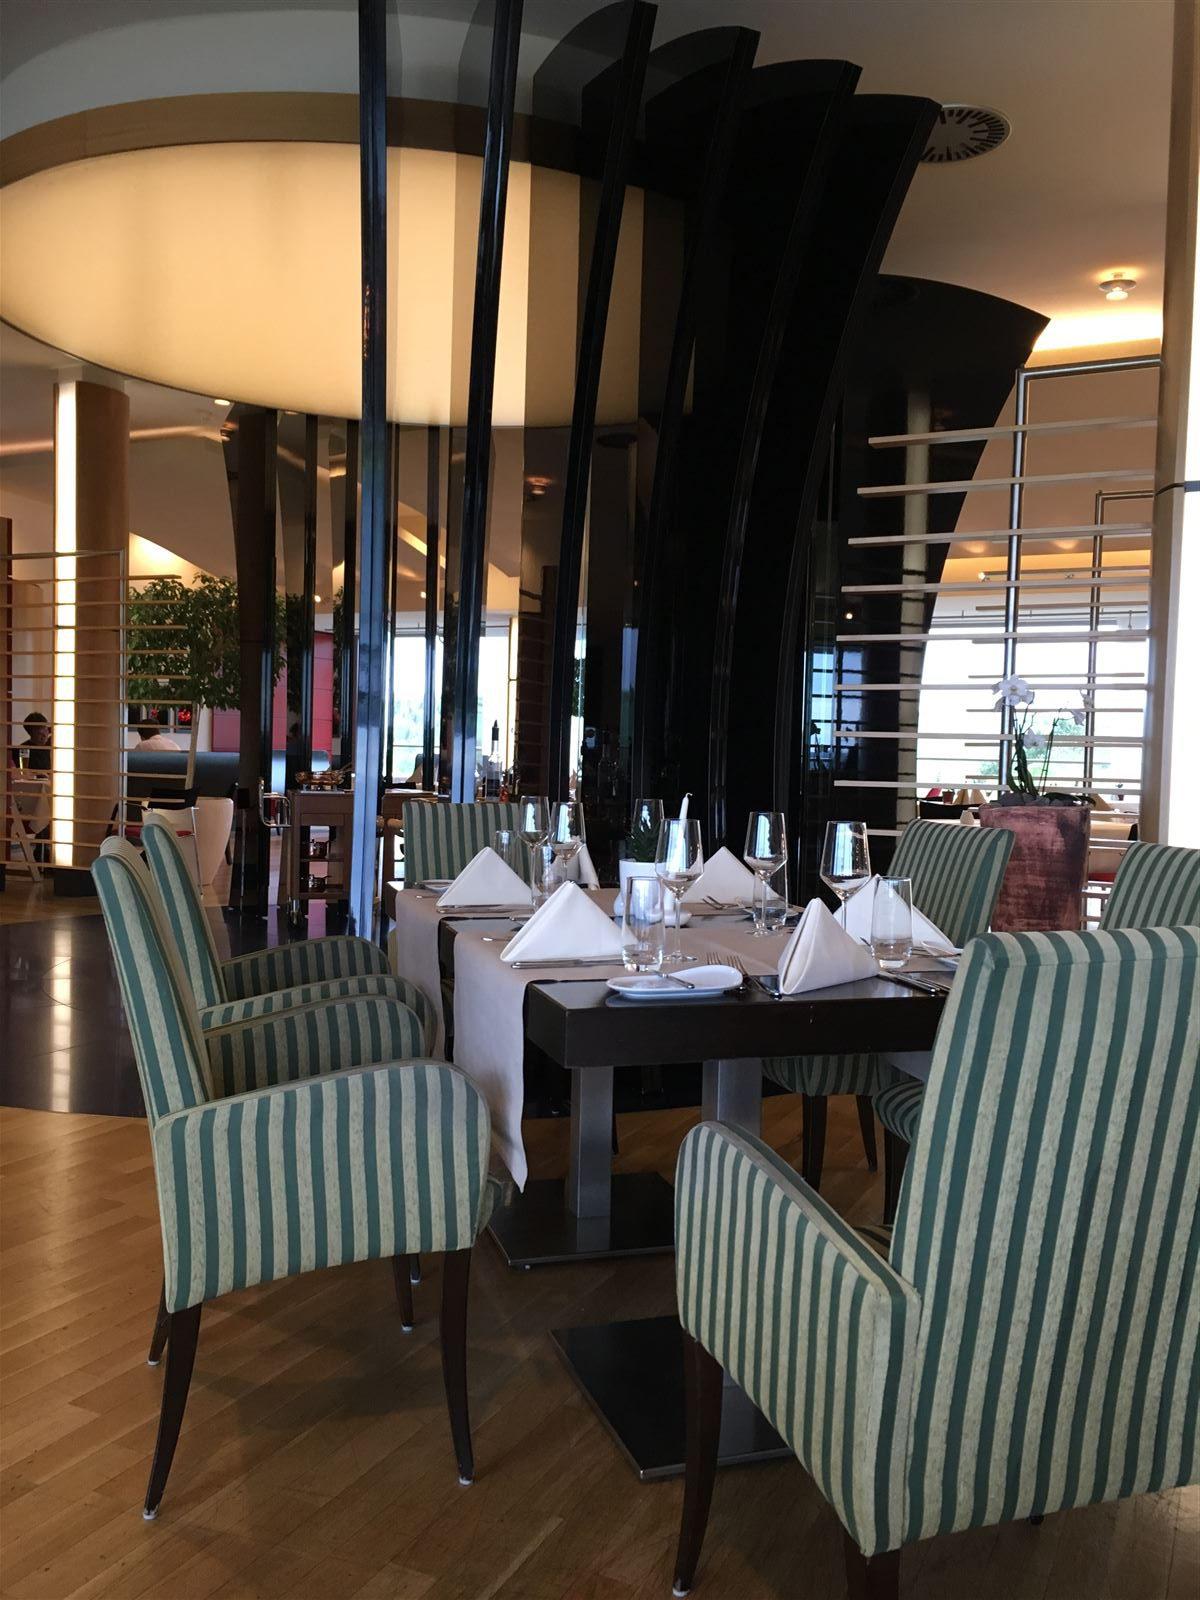 Zeulenroda - Bio-Seehotel - Restaurant